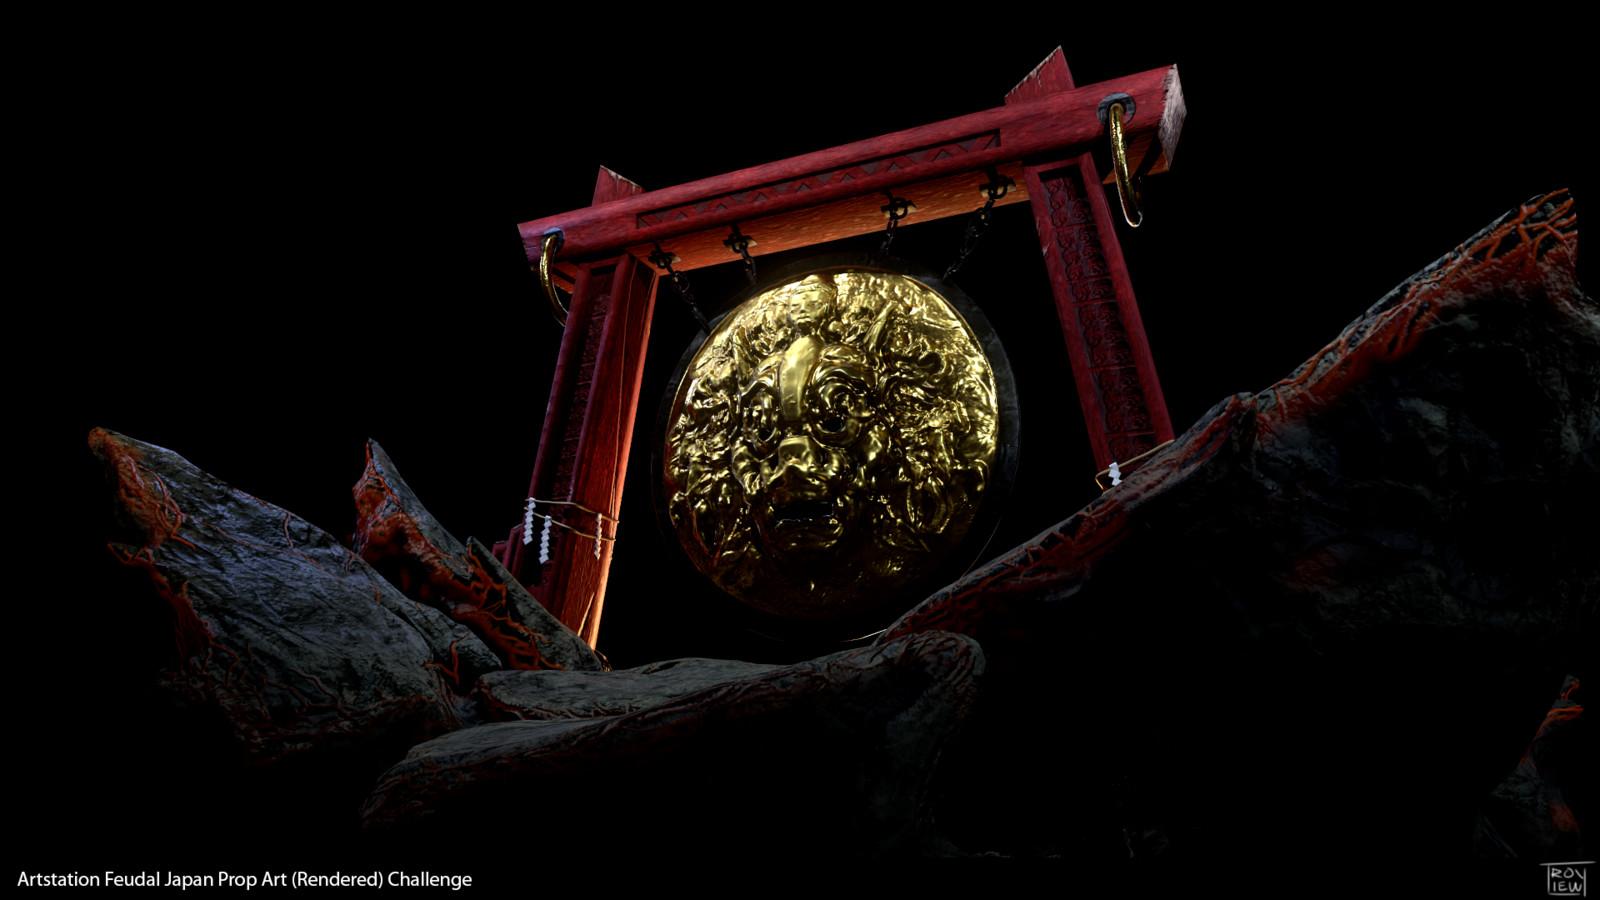 Oni Gong - Feudal Japan Prop Art Challenge